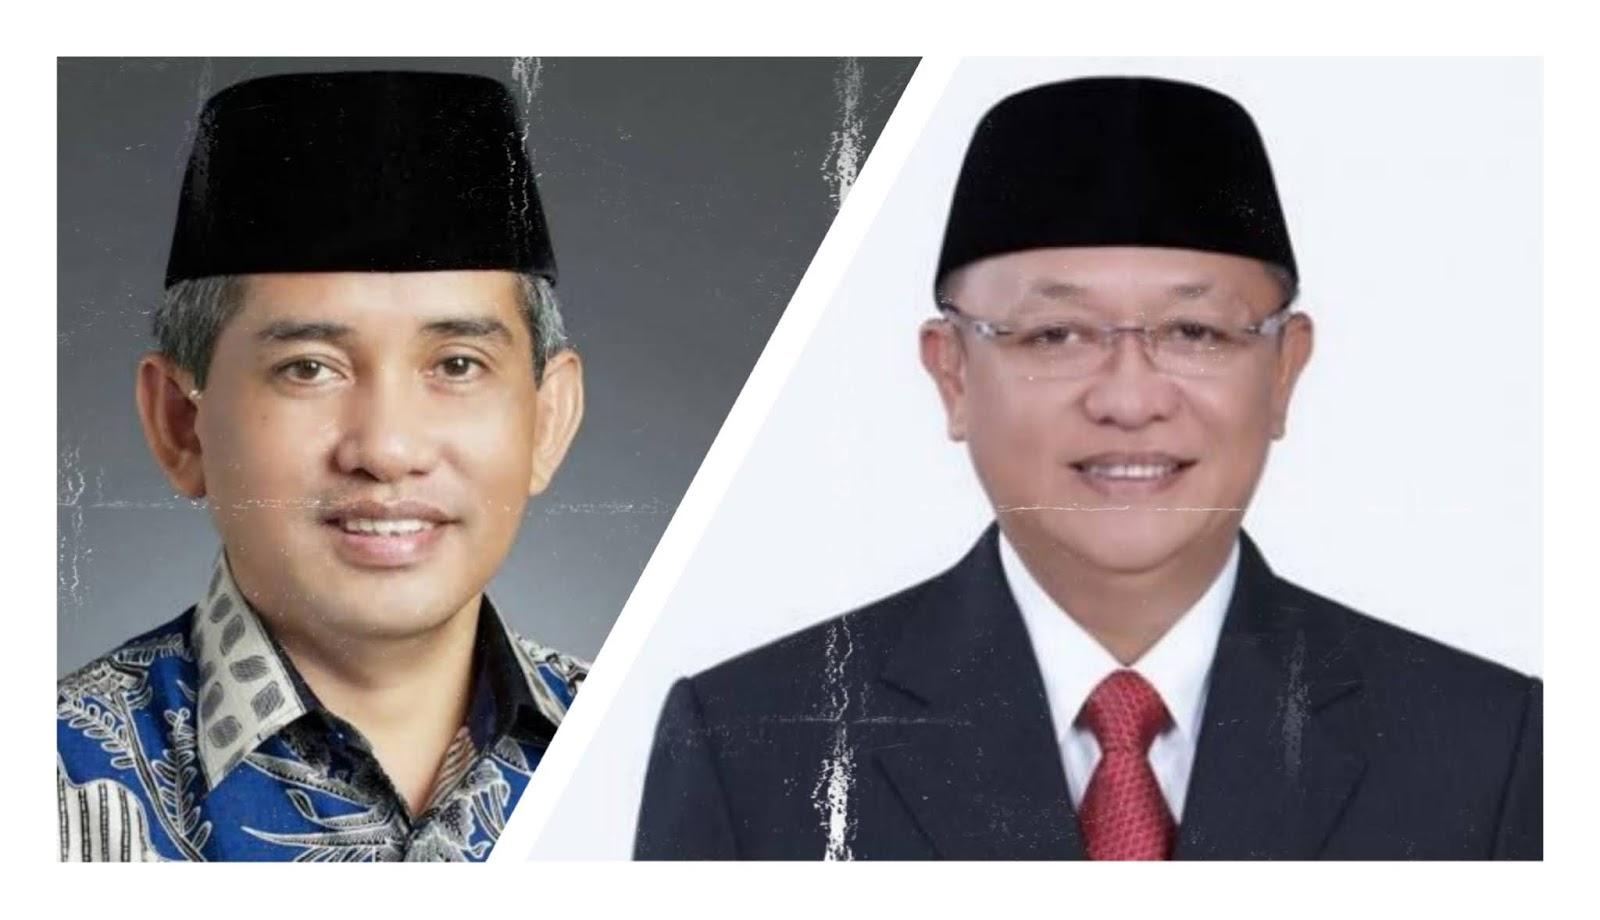 Pilgub Jambi 2020, Dukungan Seluruh Ketua DPD PAN Mengalir untuk Bakri-CE